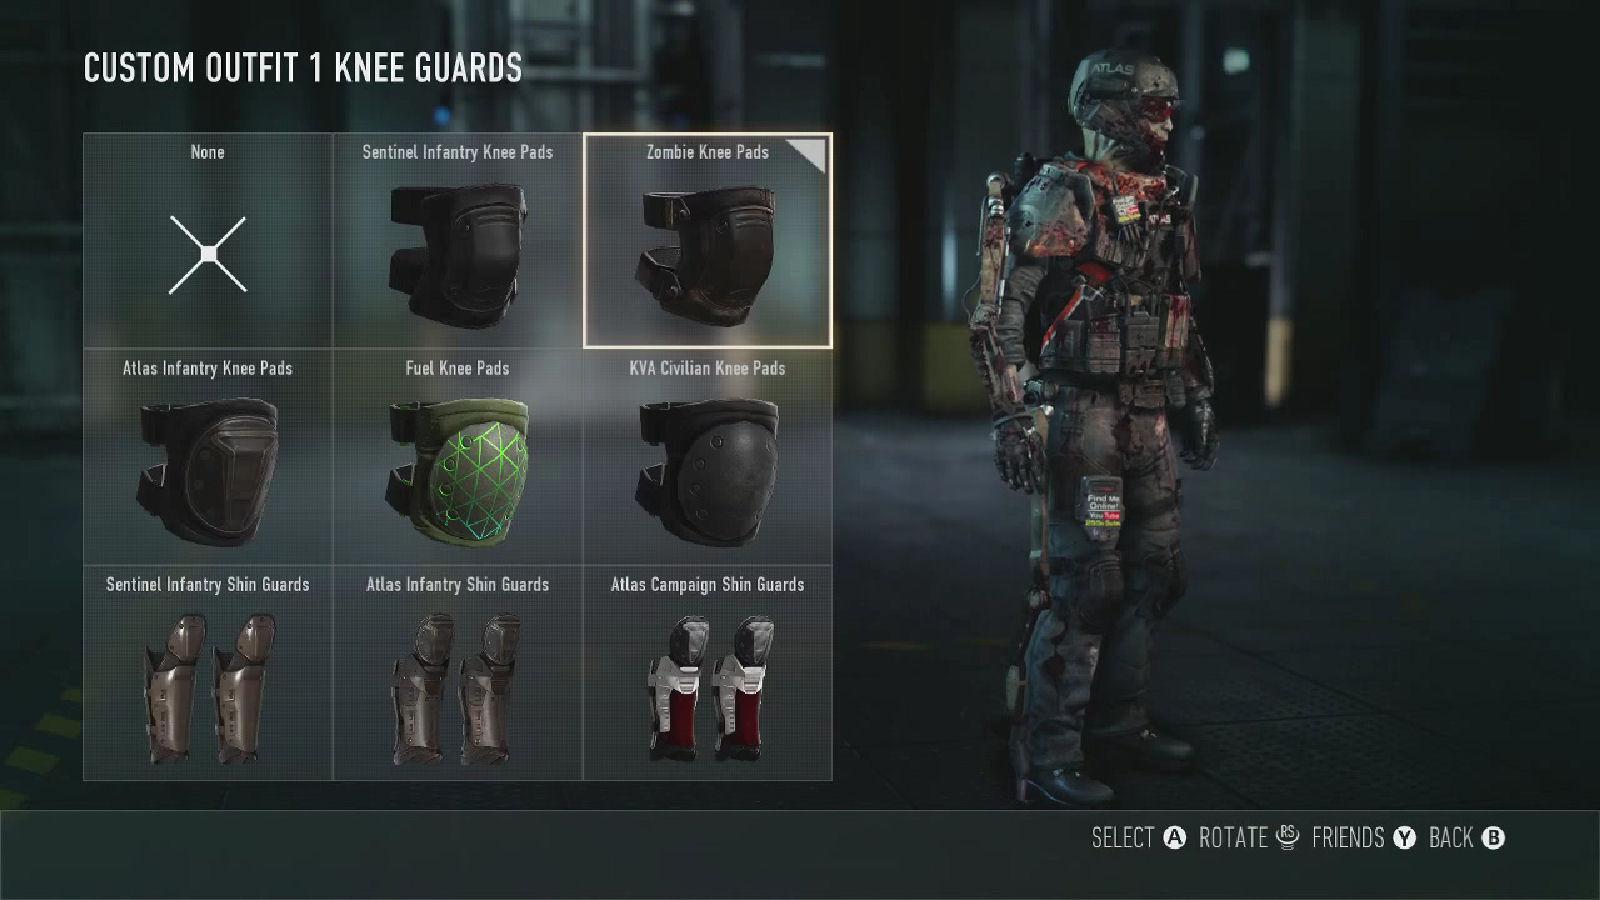 Call of Duty: Advanced Warfare Zombie Knee Pads